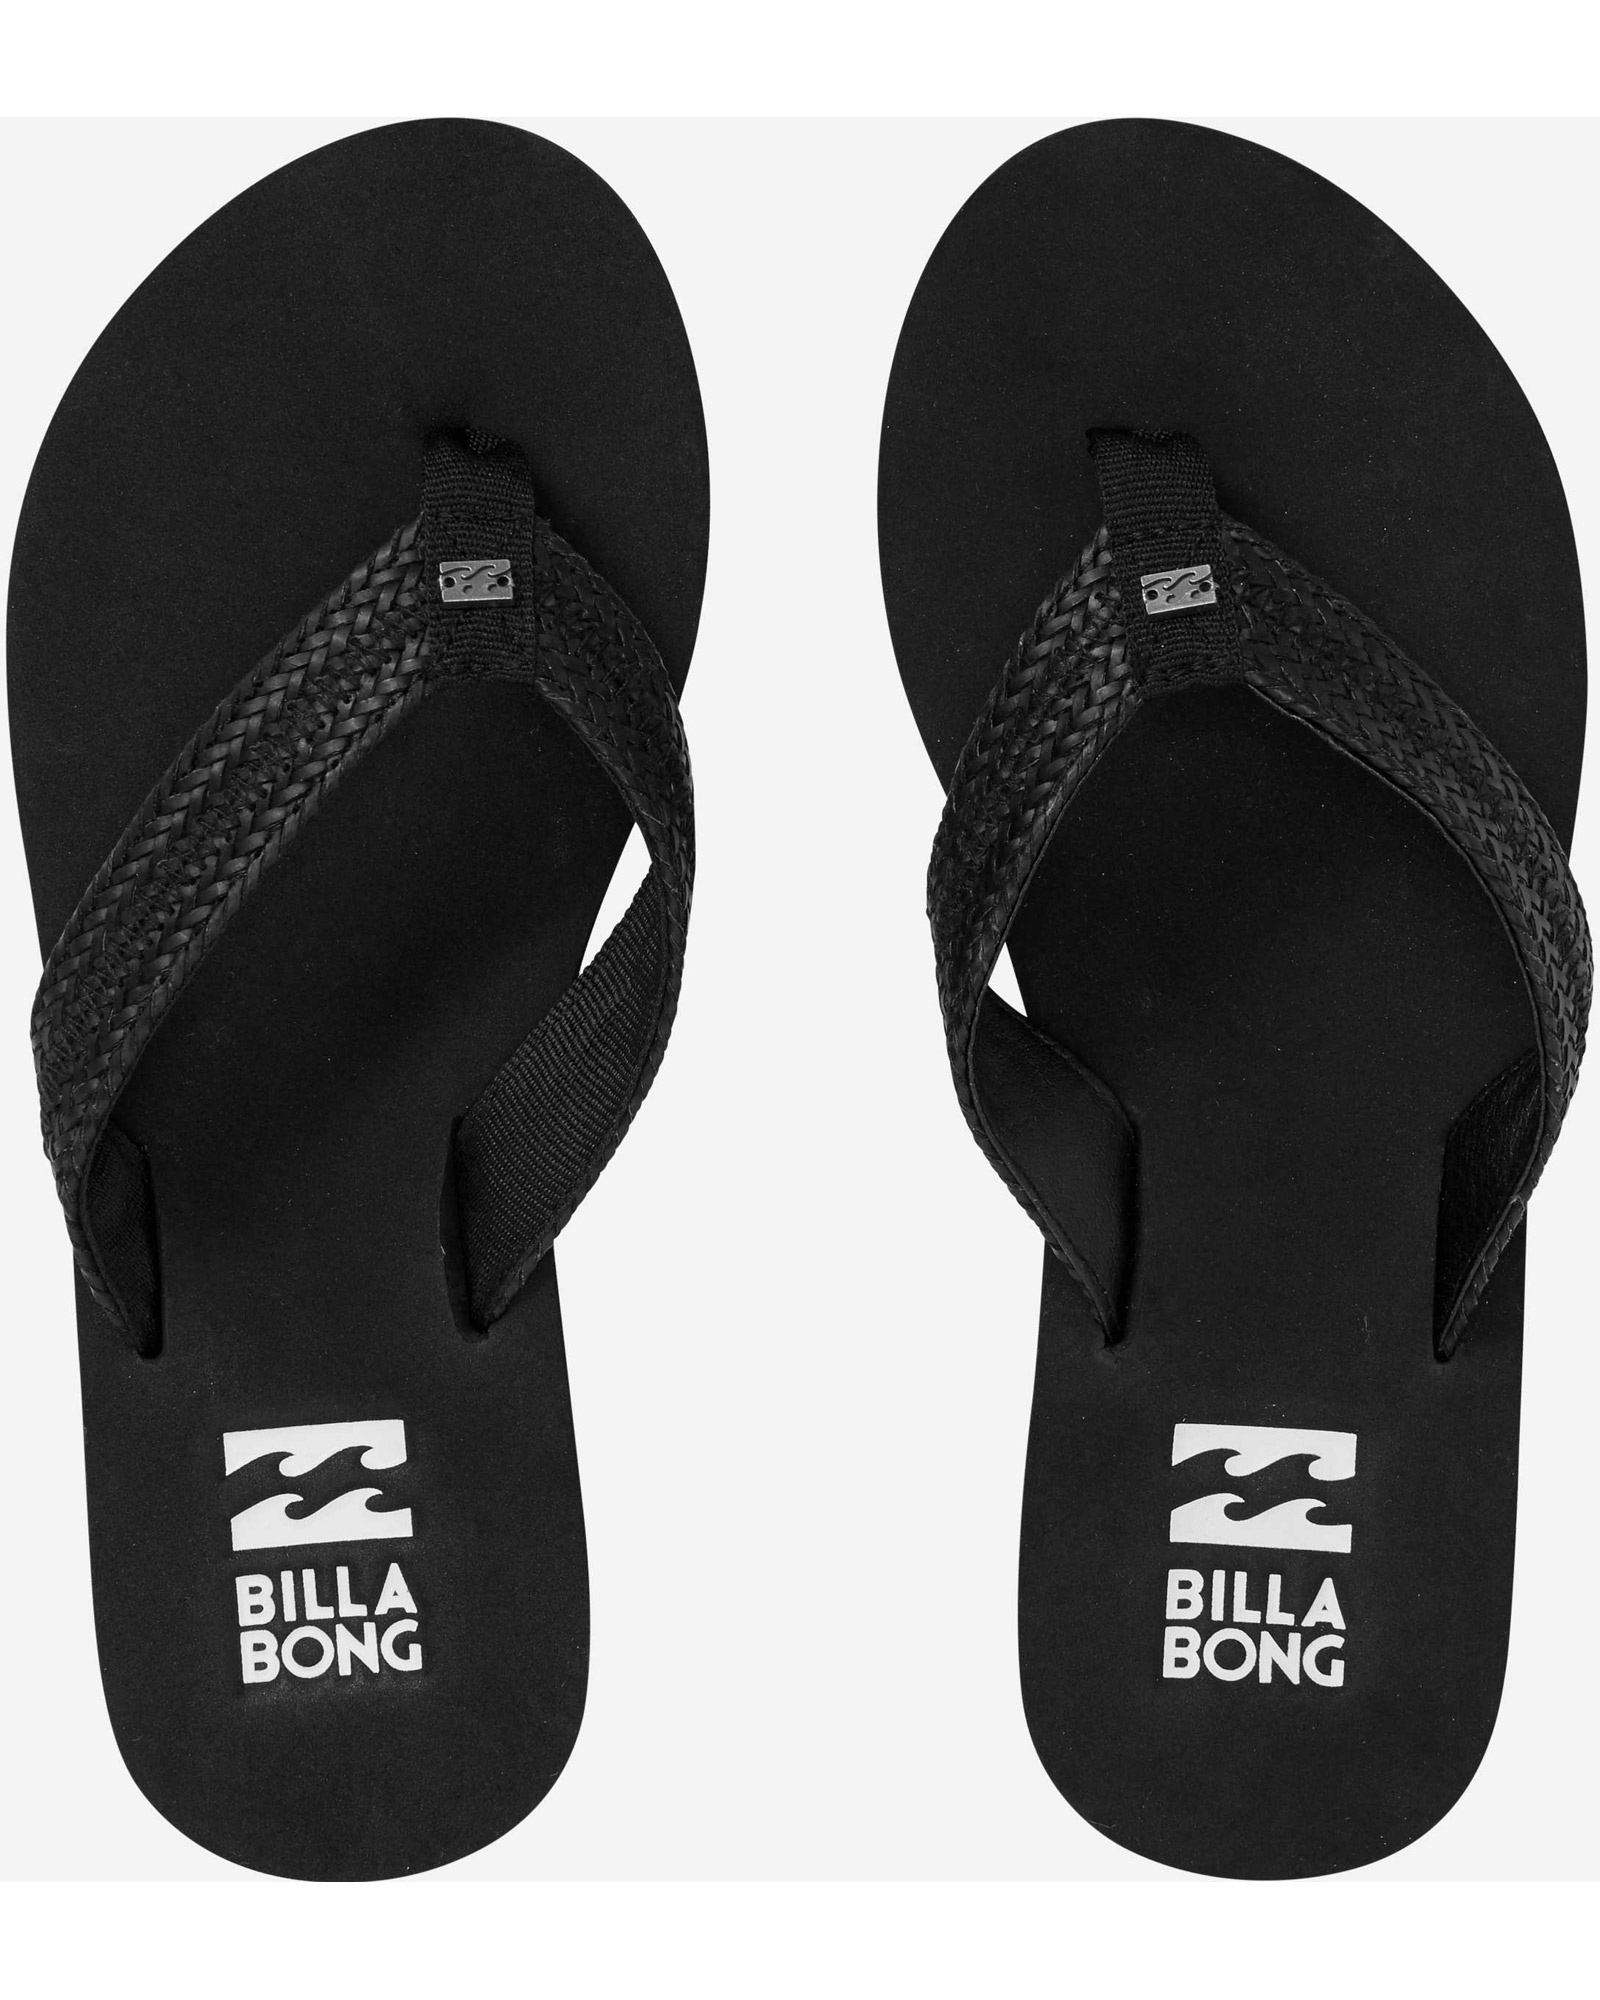 f8be6ee69bcc   BRAND NEW ITEM   - FREE SHIPPING! Billabong Kai Sandals Womens Black